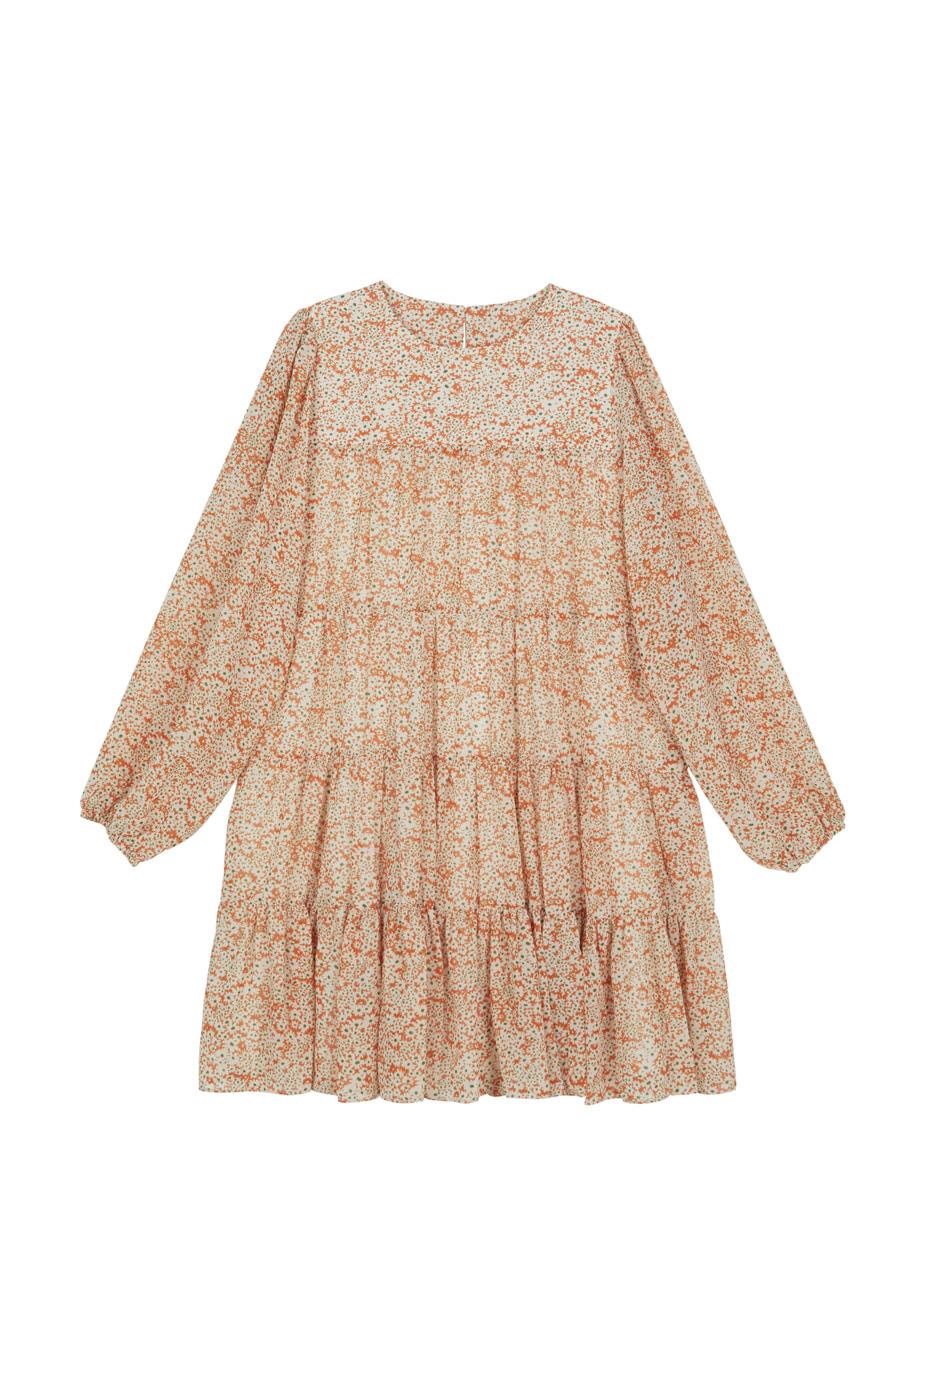 Tiny flower mini dress